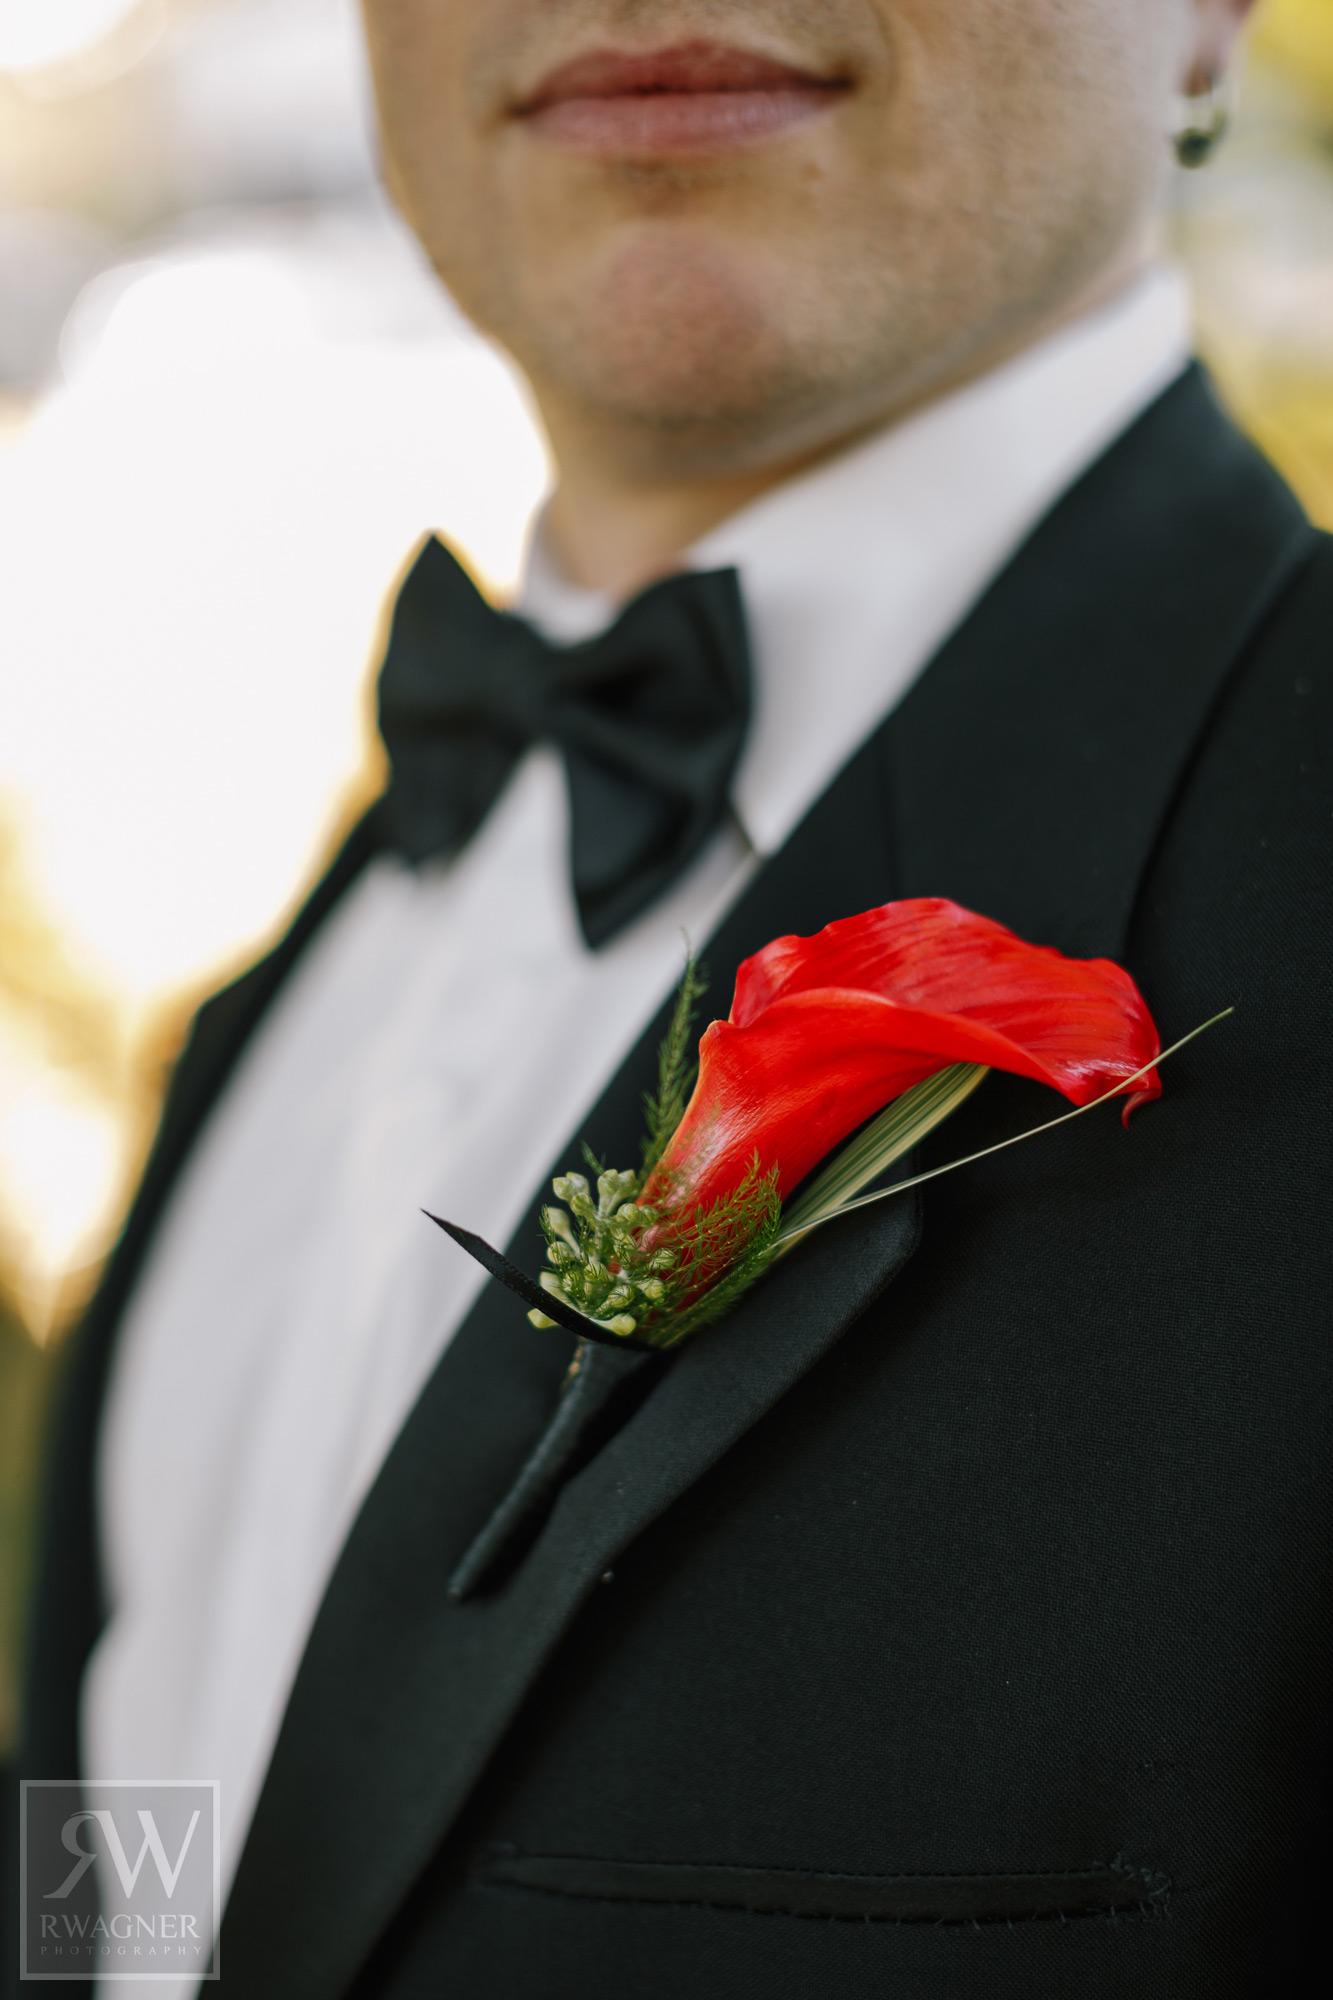 ceci_new_york_luxury_wedding_invitations_couture_red_black_white_real_wedding_dramatic_inn_at_longshore_v286_15.jpg